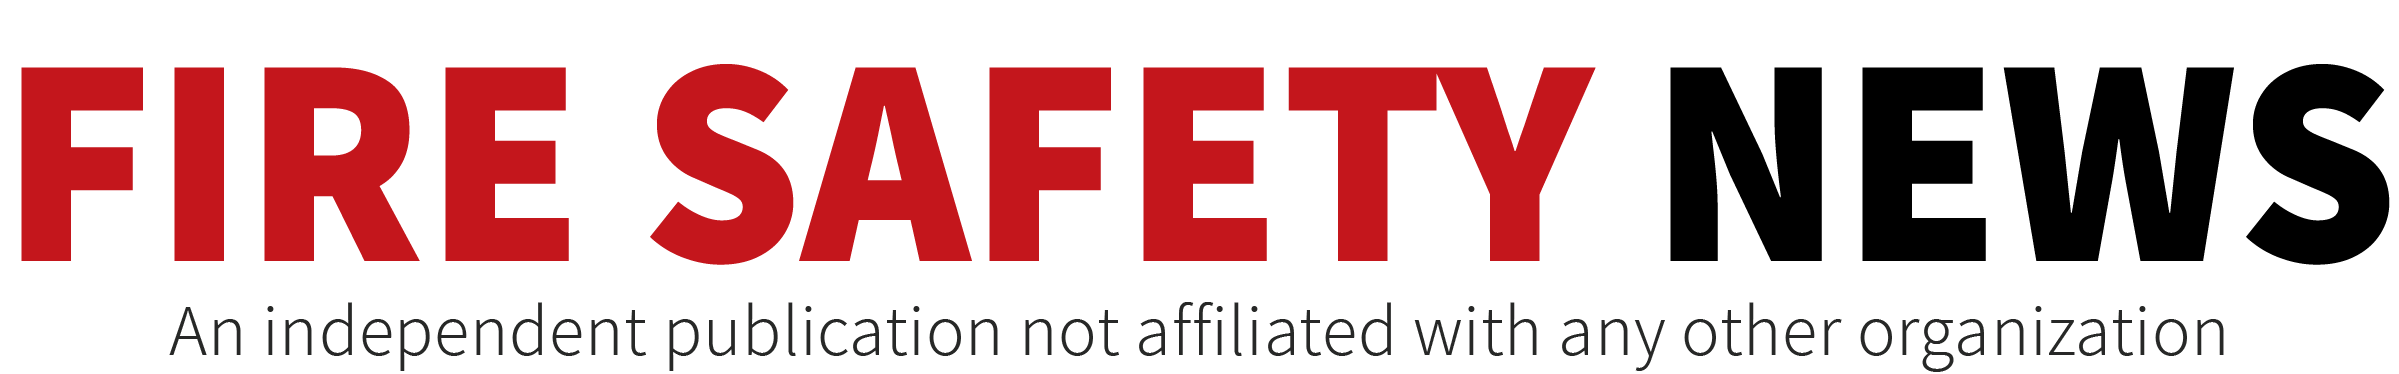 Fire Safety News logo